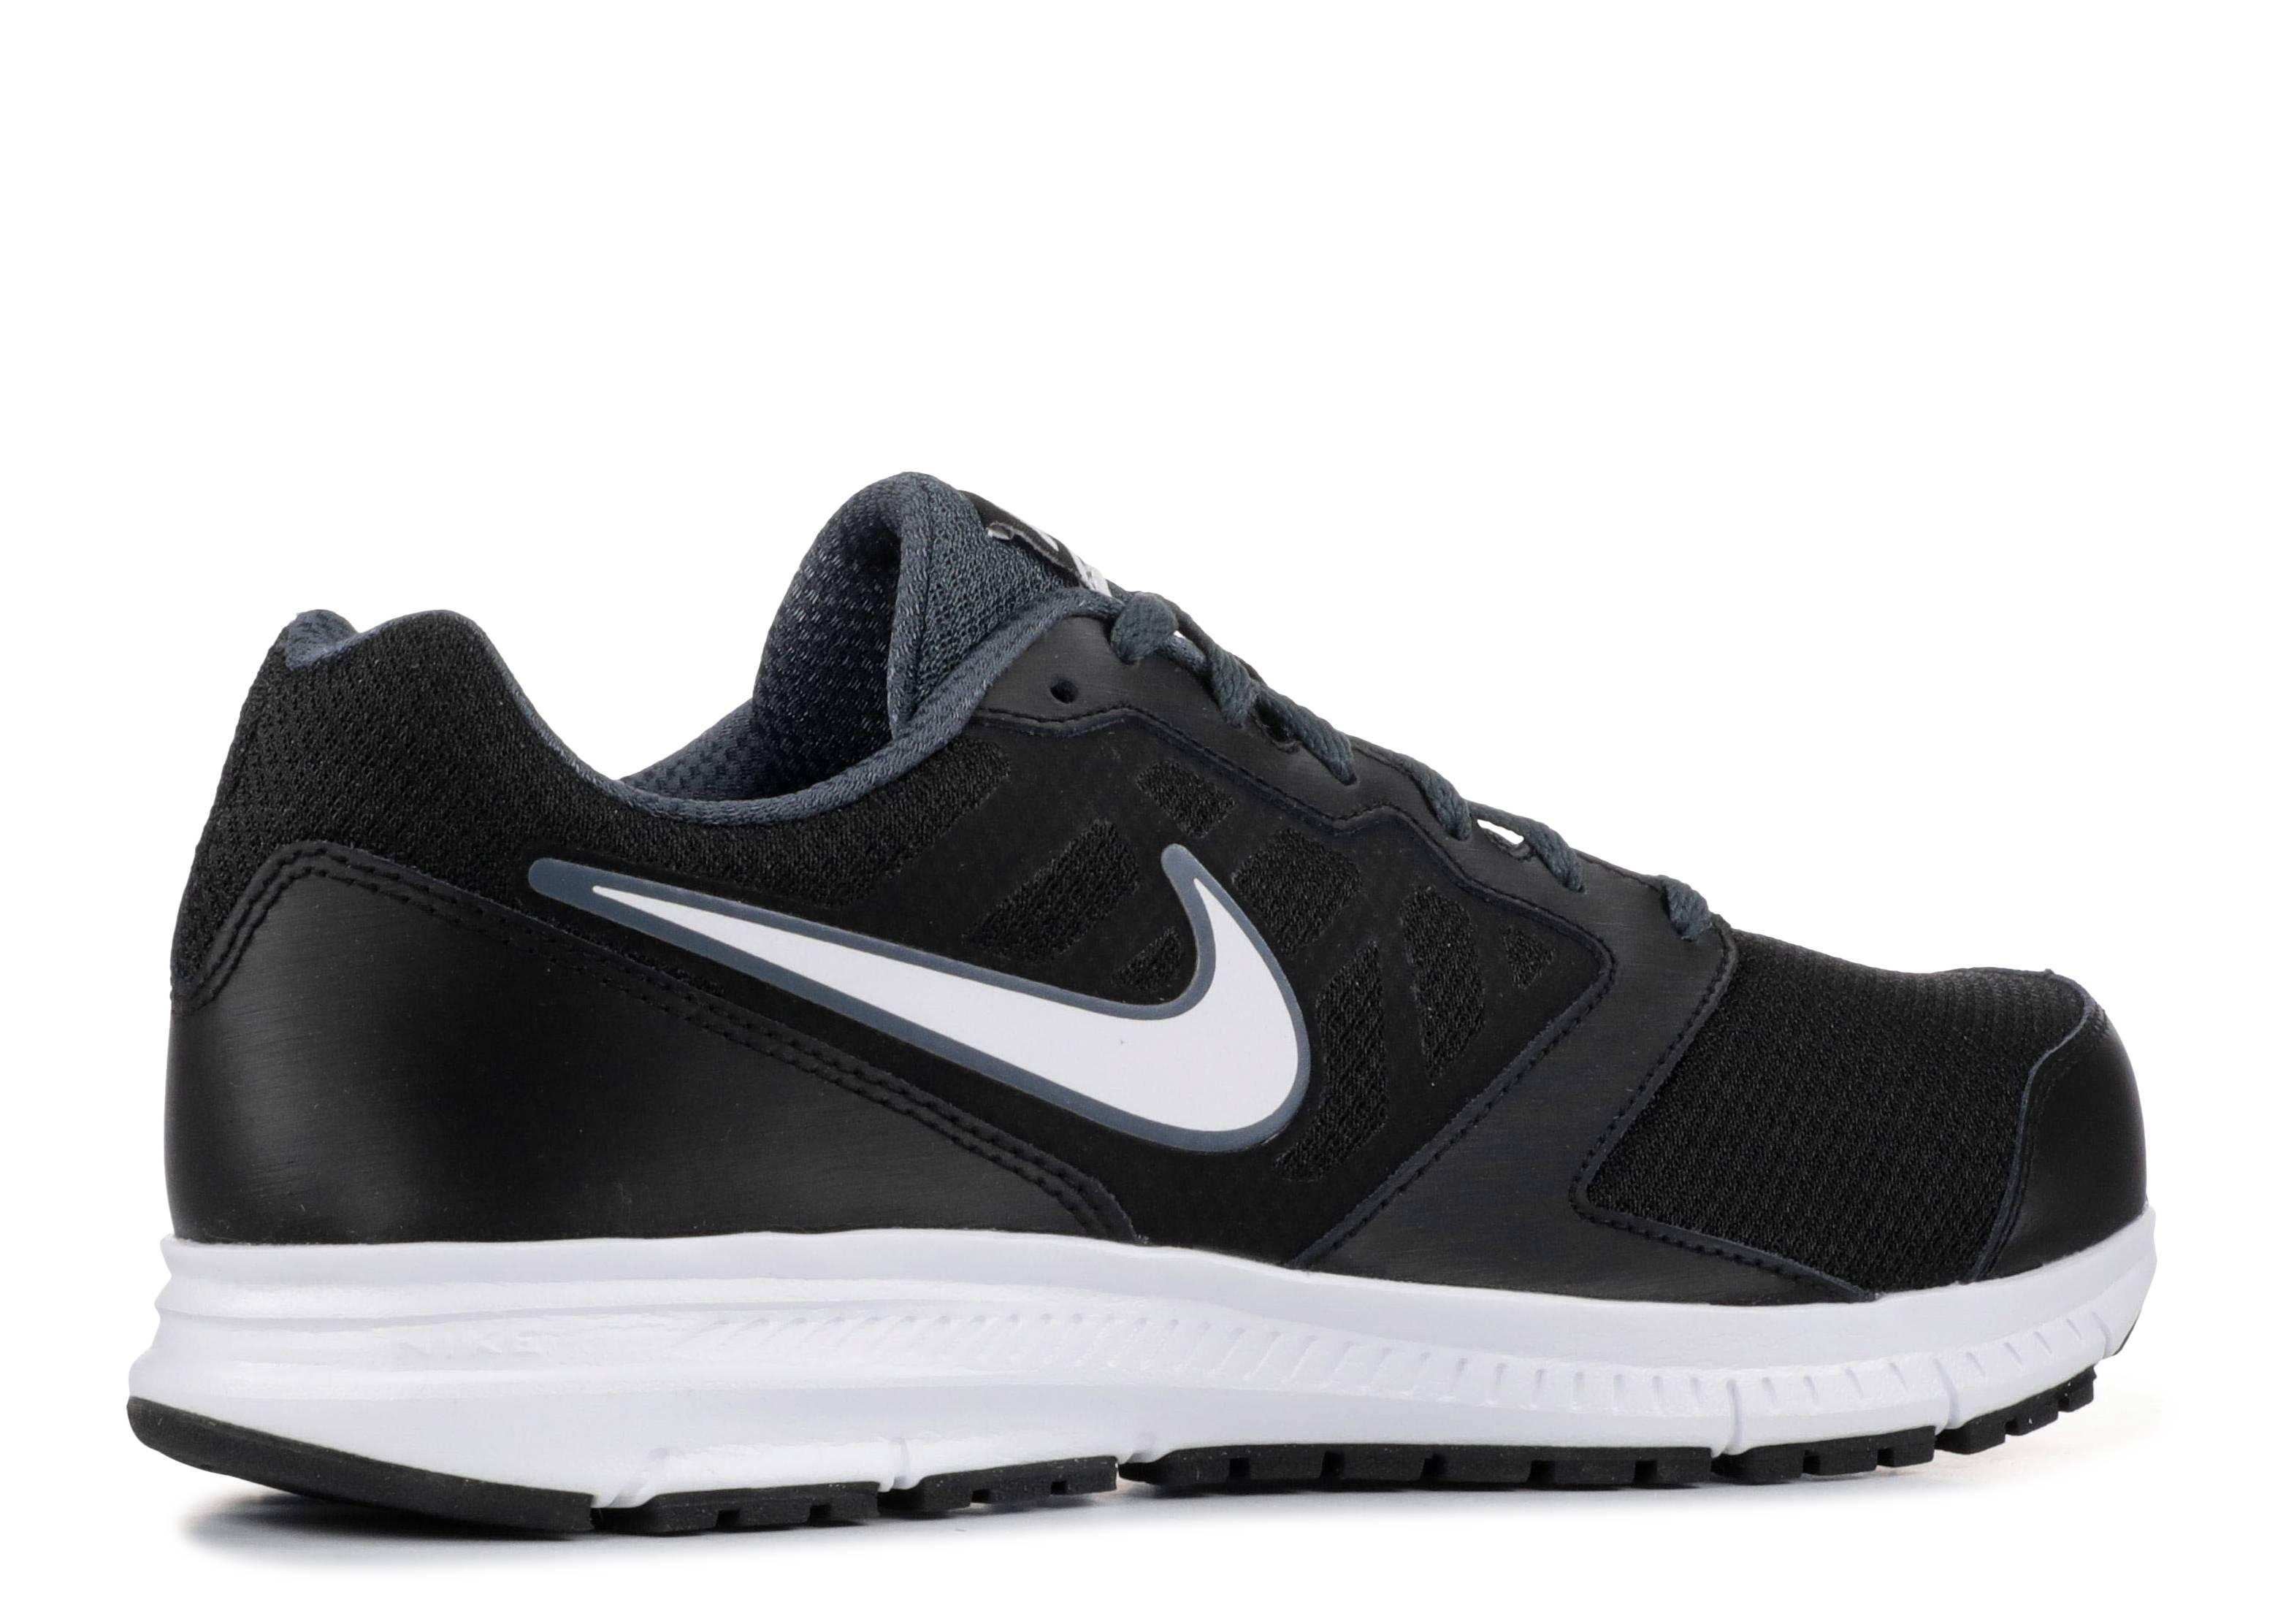 low priced 9e038 0b117 Nike Down Shifter 6 4e - Nike - 684653 003 - black whitre-dk magnet grey    Flight Club